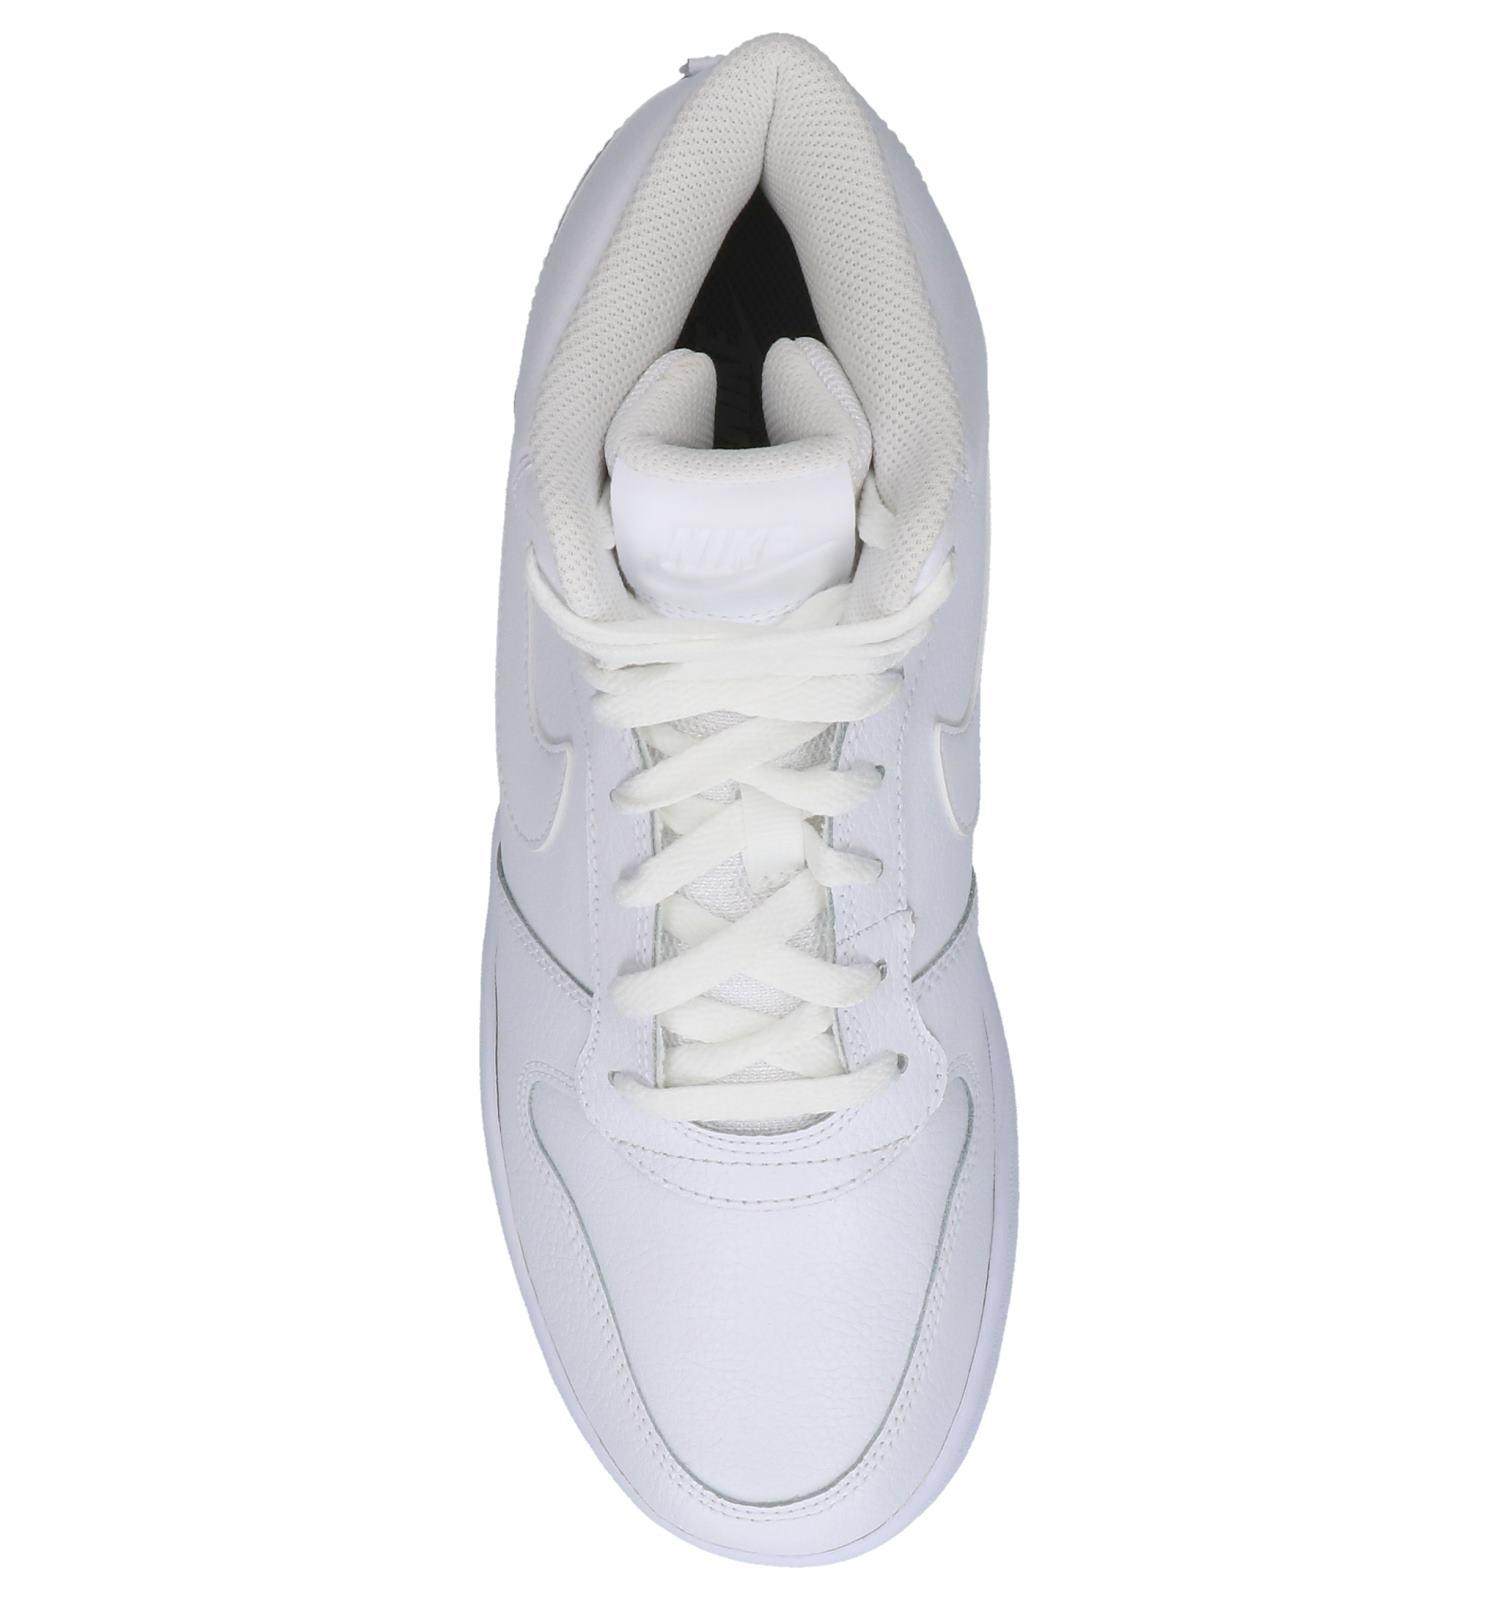 8160acbaf072 Nike Baskets hautes (Blanc)